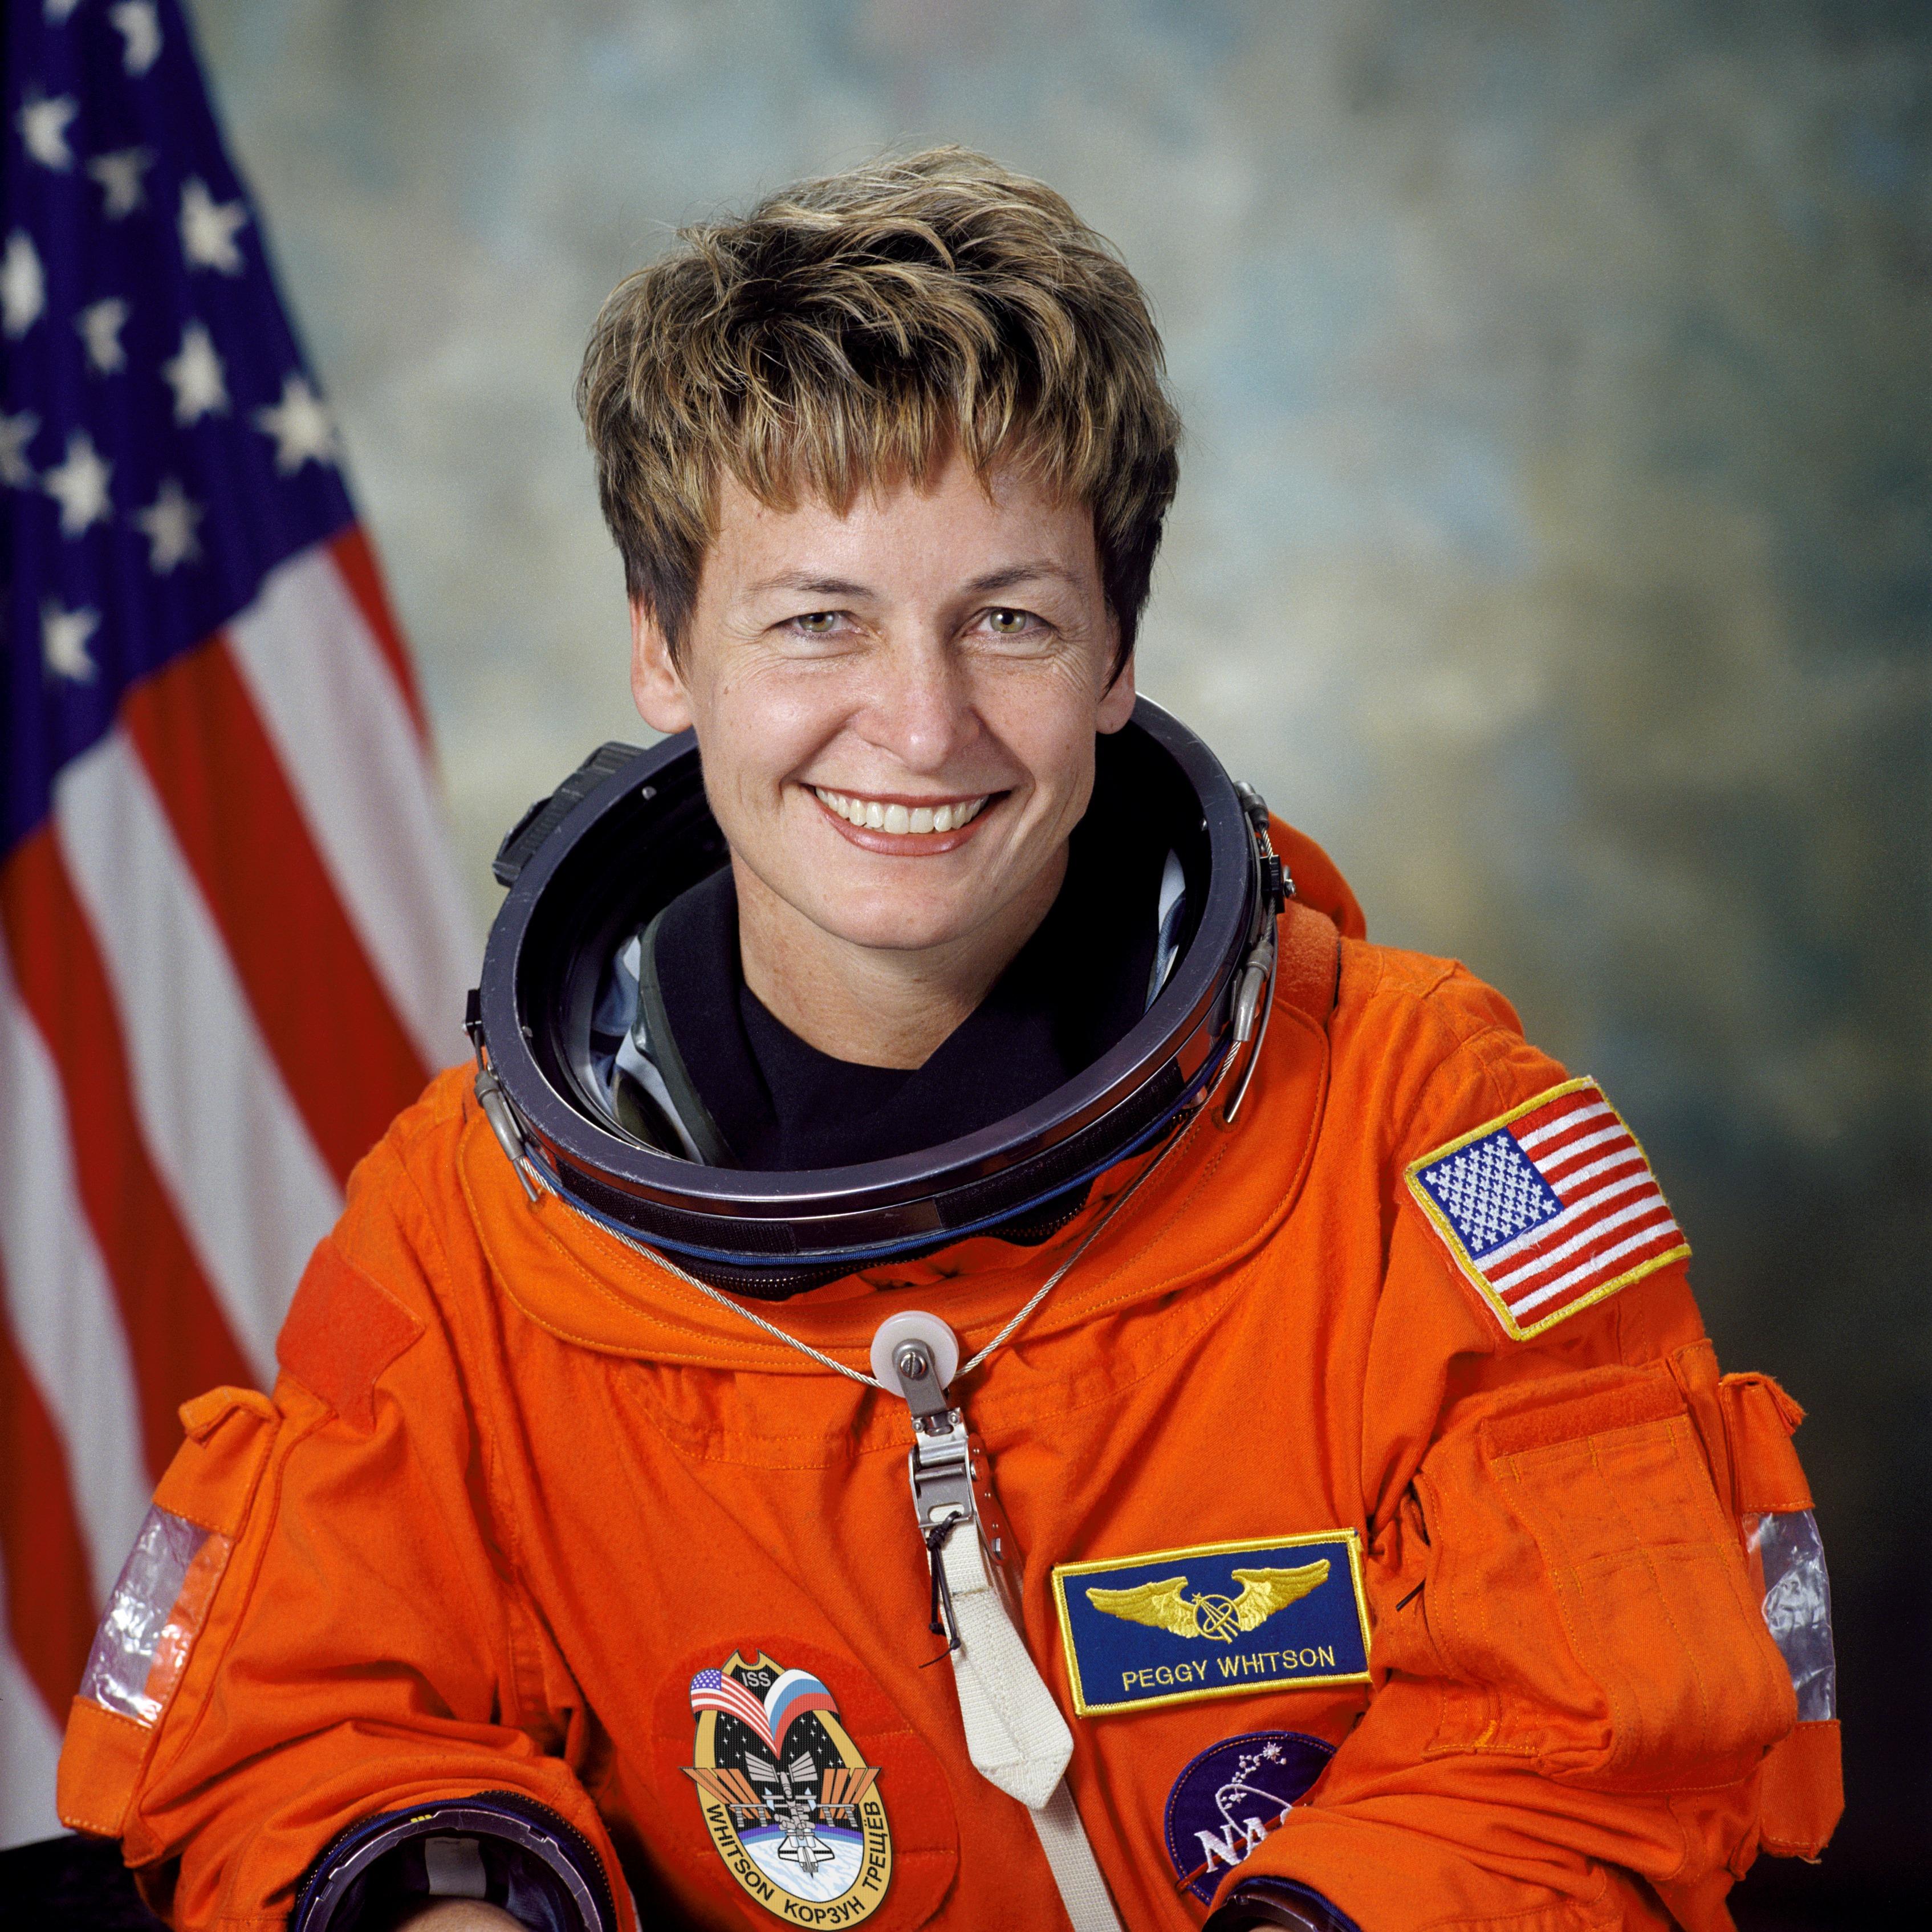 Peggy Whitson - Wikipedia